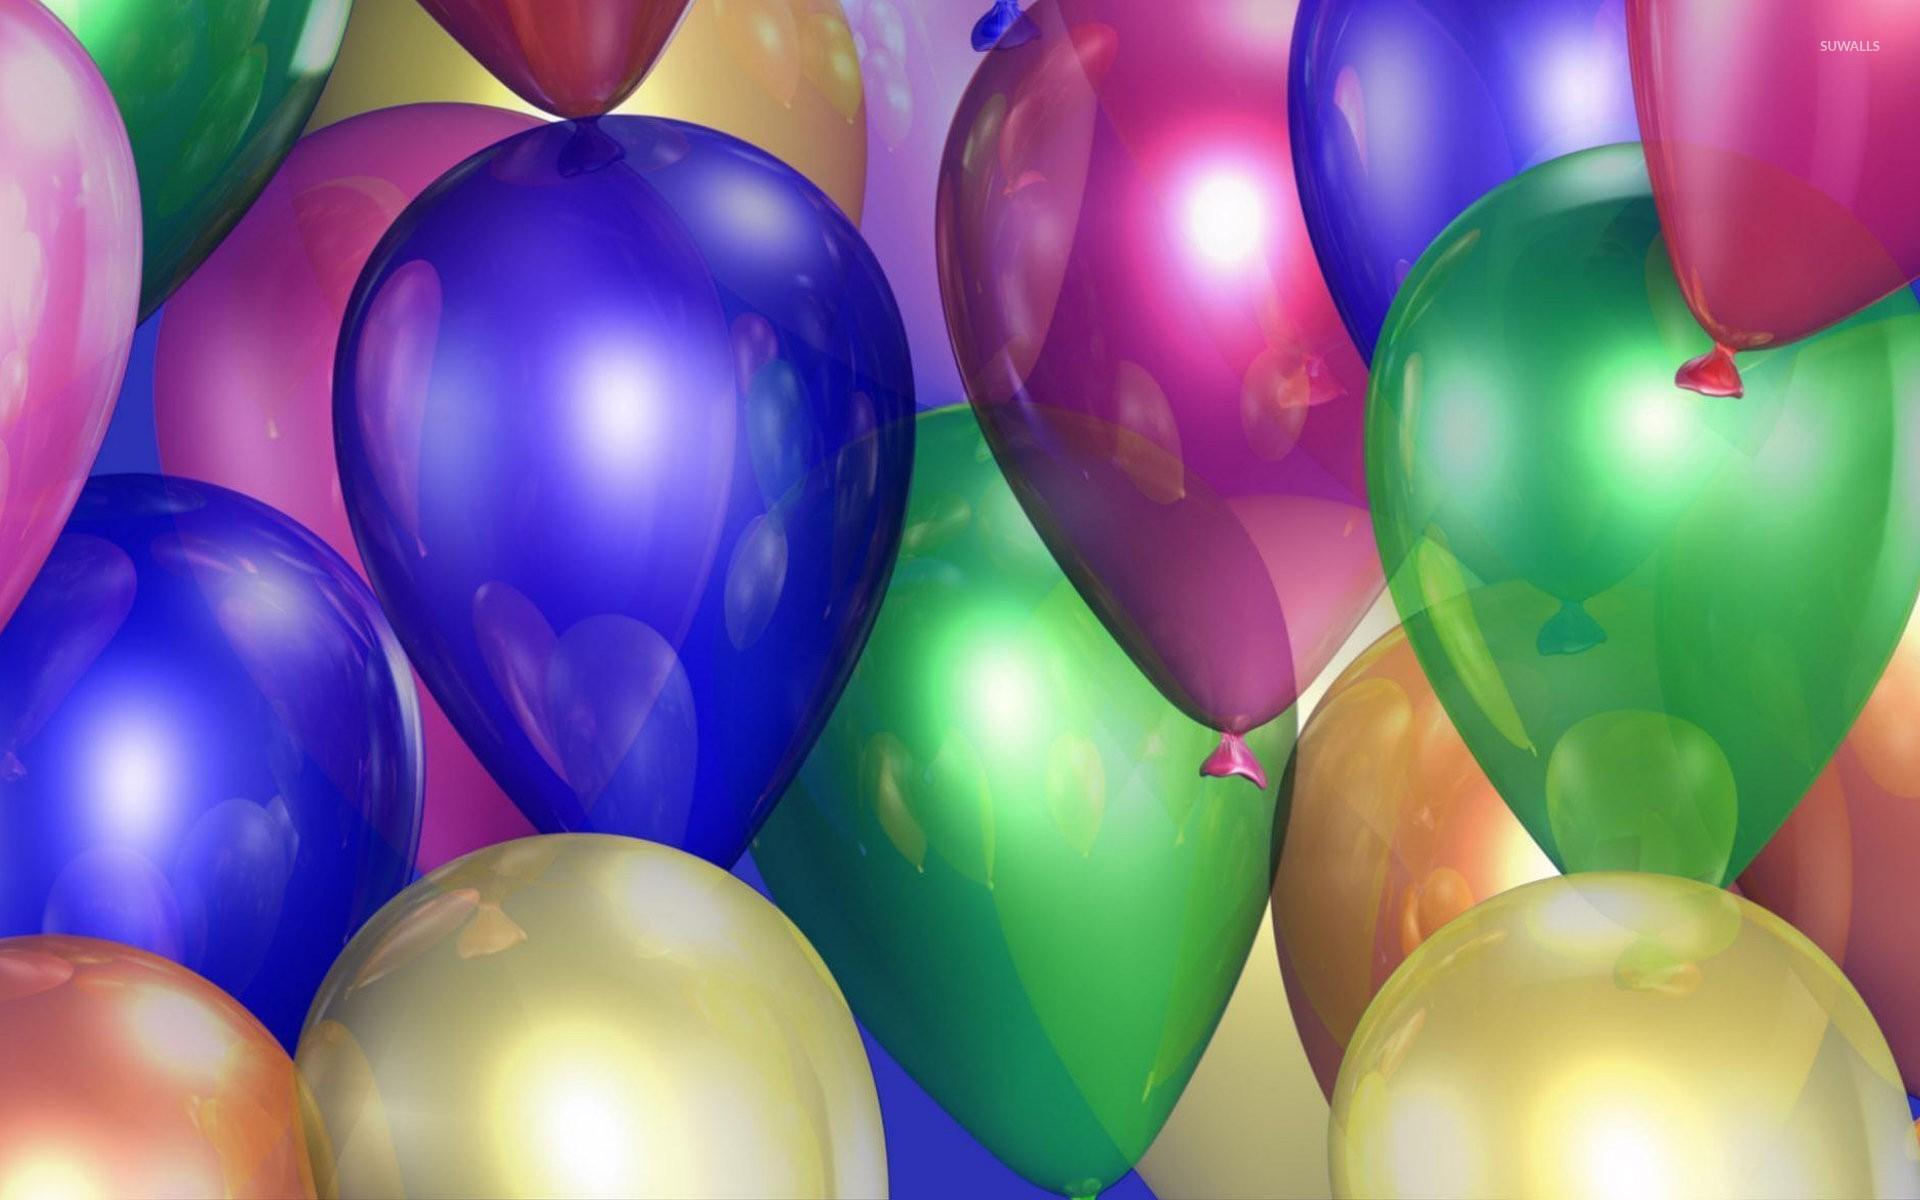 Colorful shiny balloons wallpaper